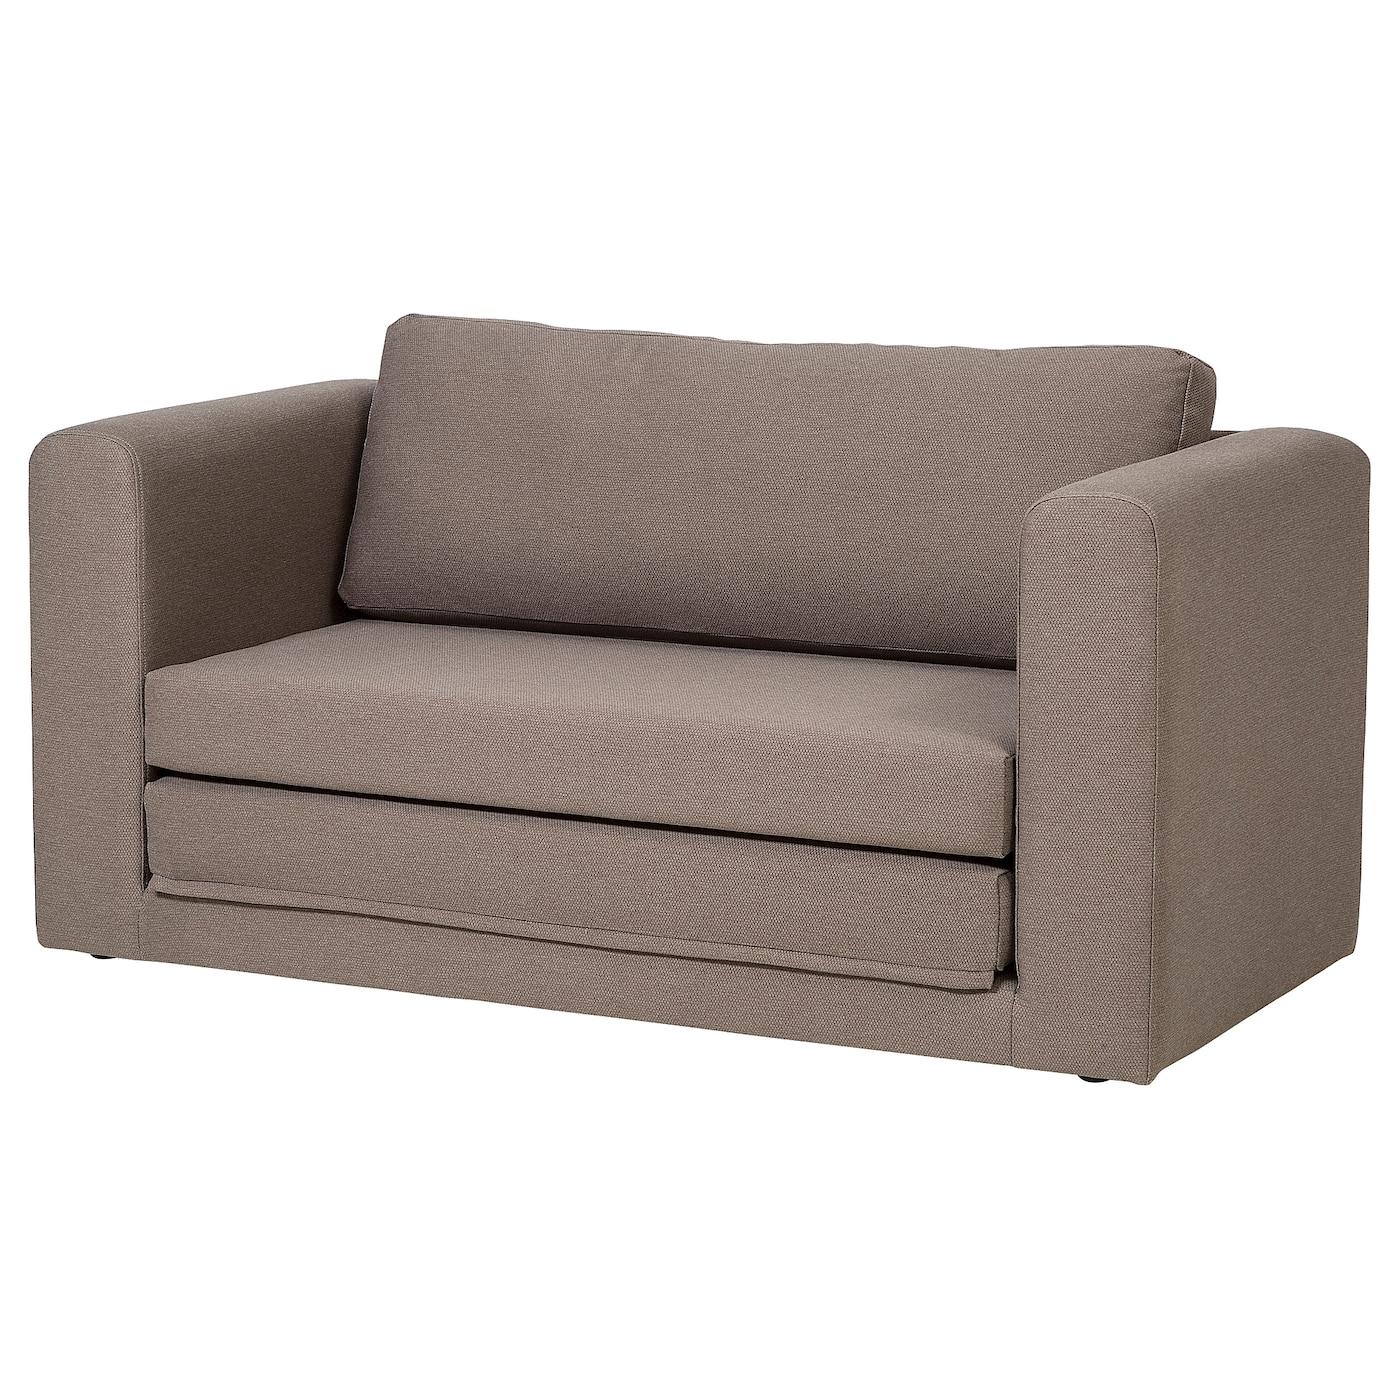 ASKEBY 2 seat sofa bed, Dansbo medium brown   IKEA Ireland